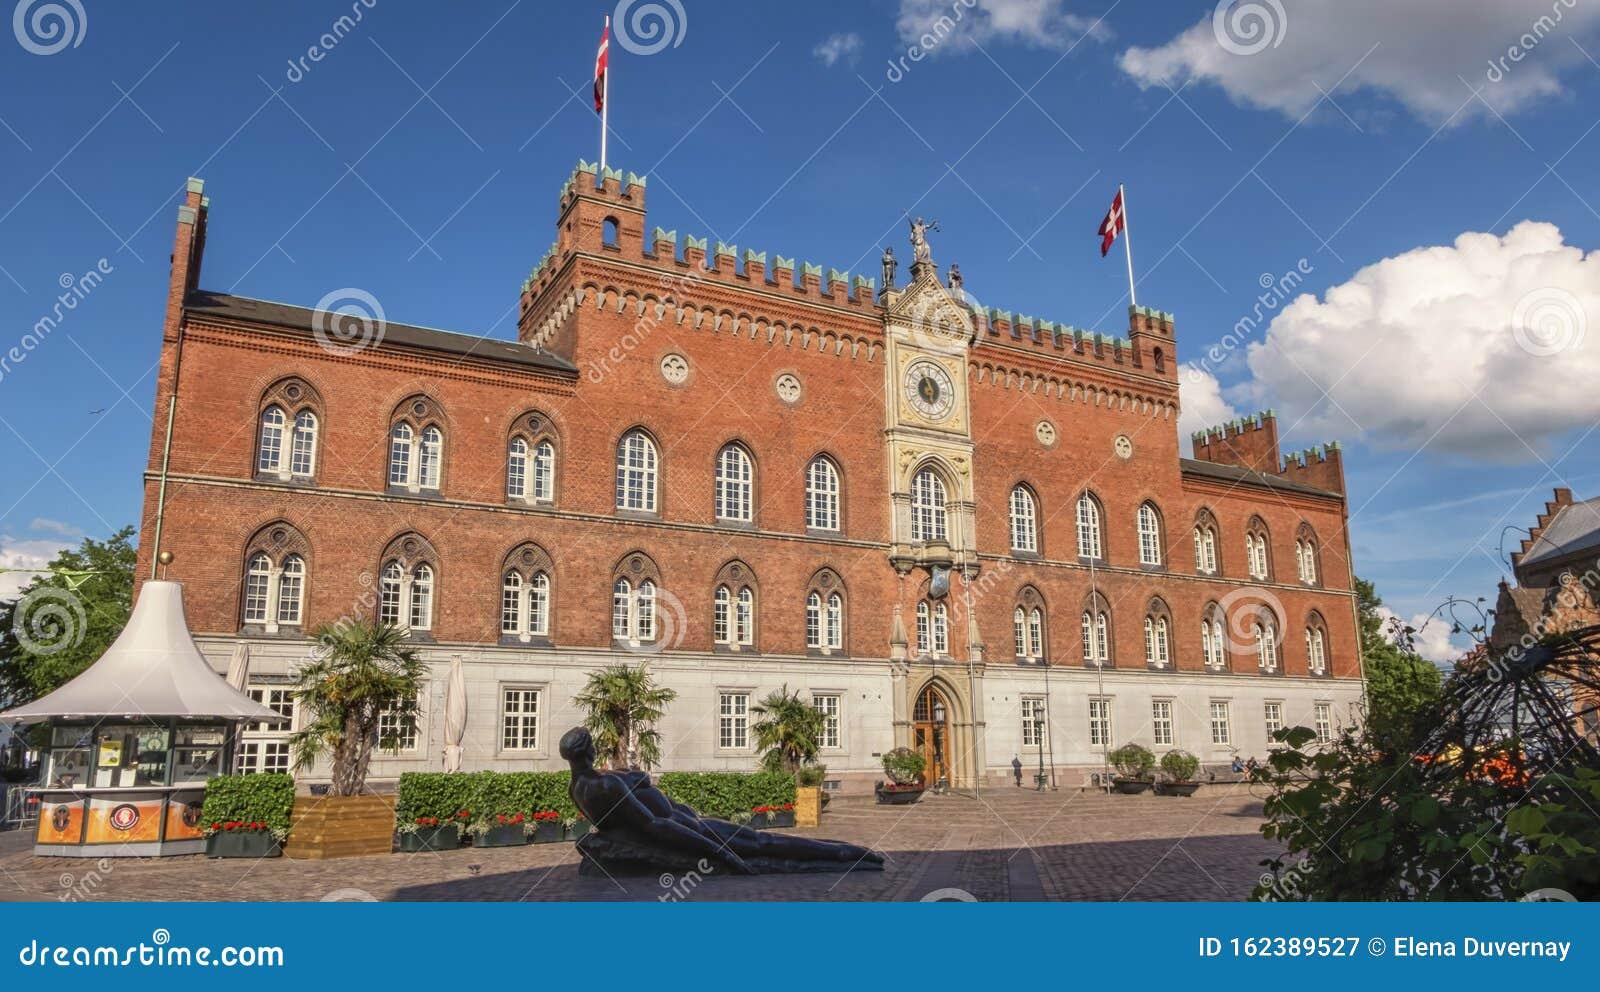 City Hall in Odense, island of Funen, Denmark